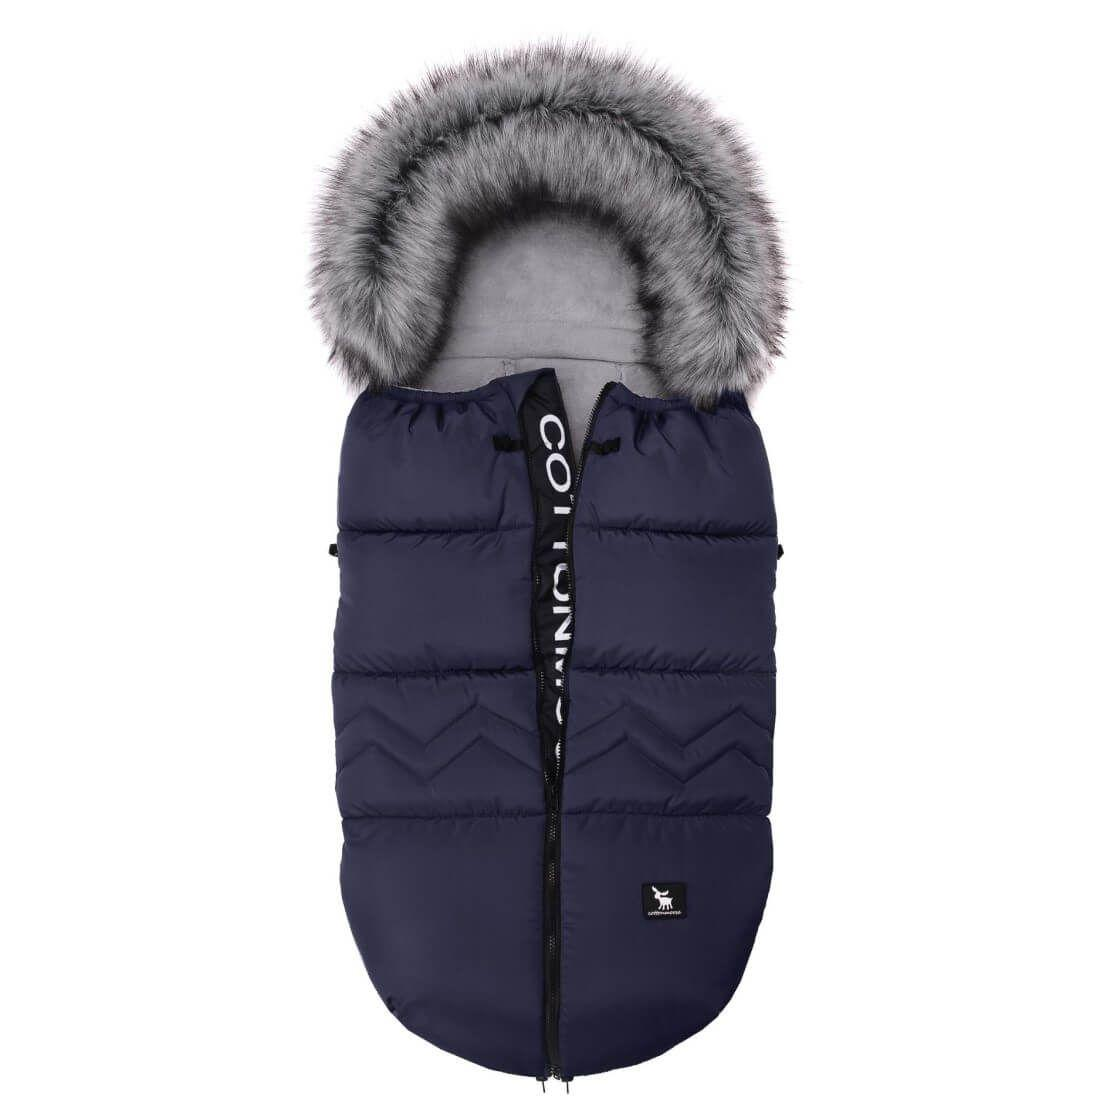 Temno modra zimska vreča Moose YUKON North, Cottonmoose